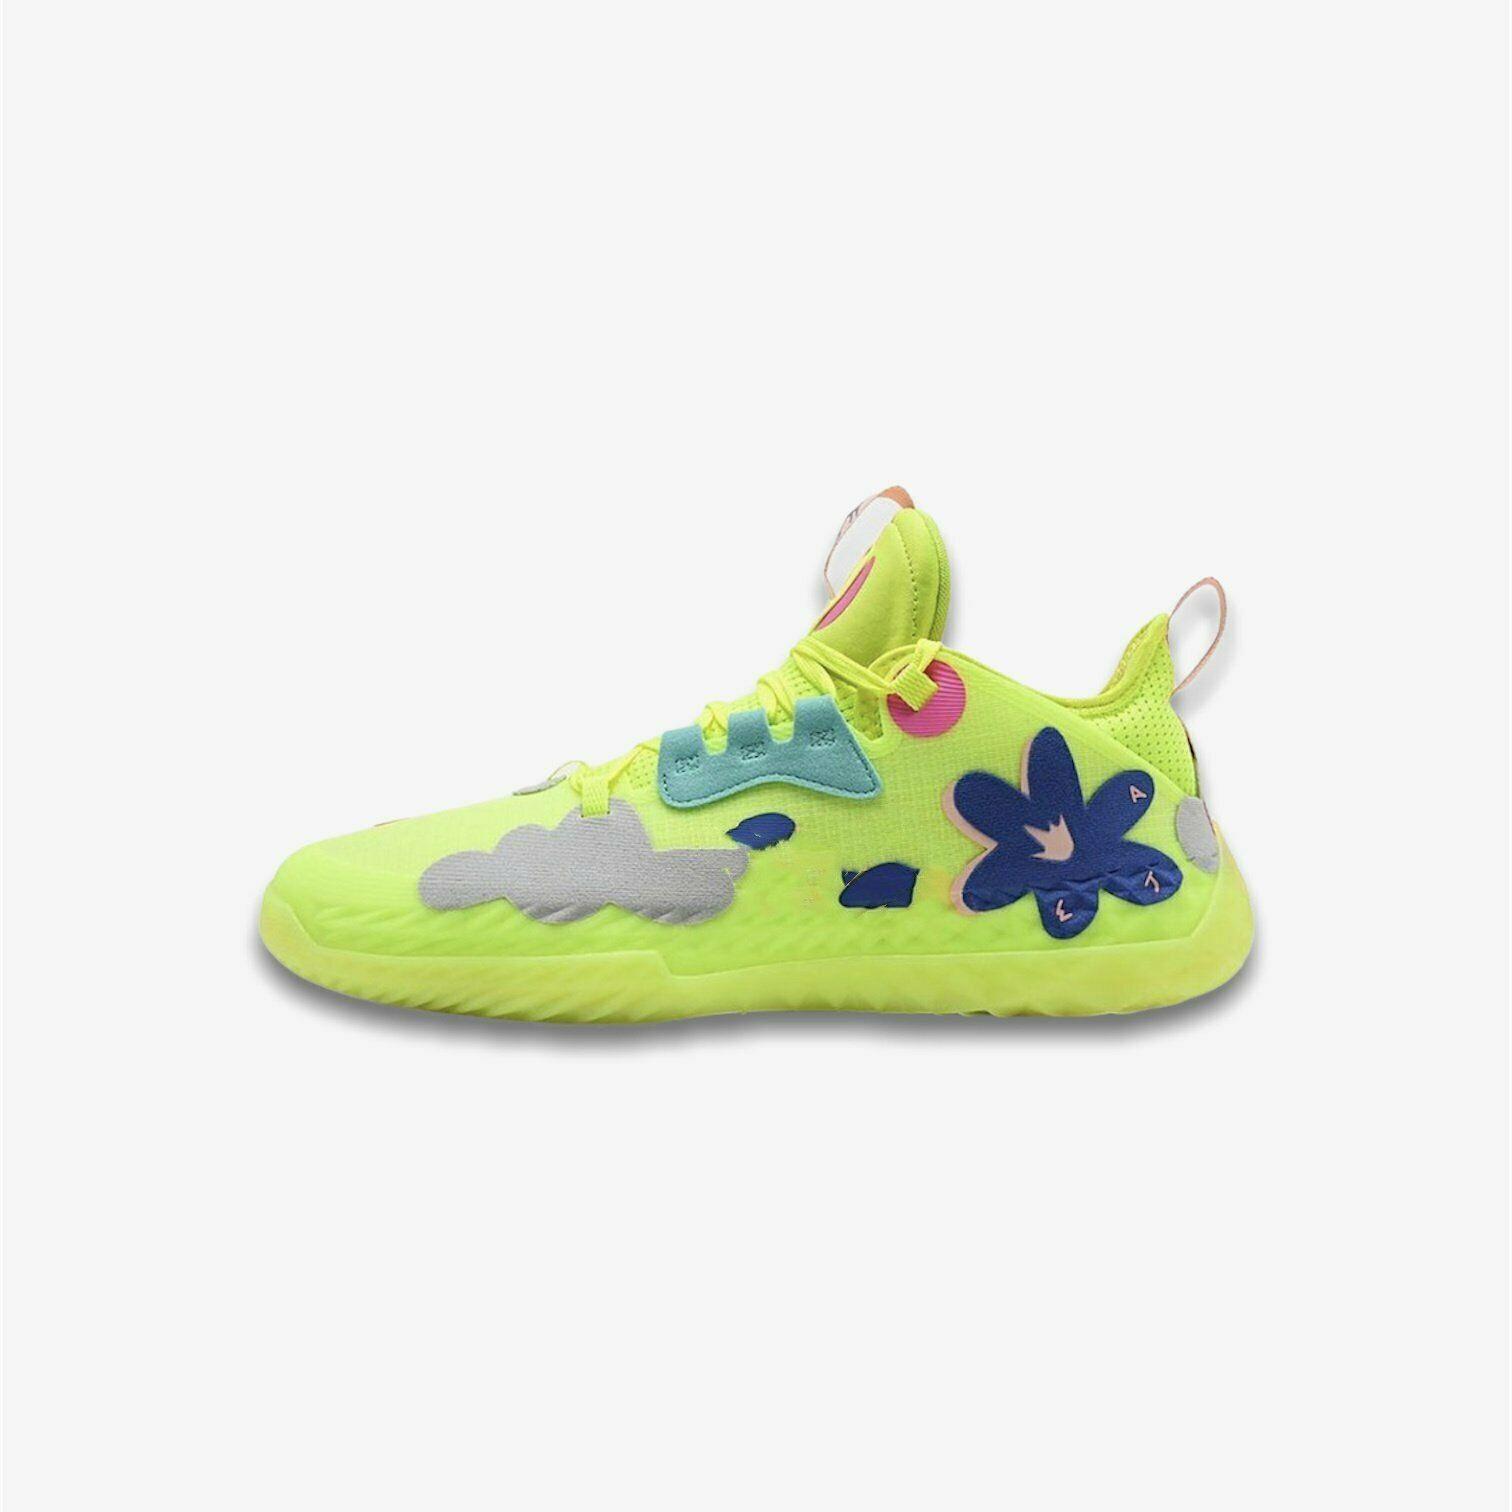 Harden Vol 5 futurenatural الرجال كرة السلة أحذية عالية الجودة الخالق CNY دعم الأحذية الرياضية مع مربع